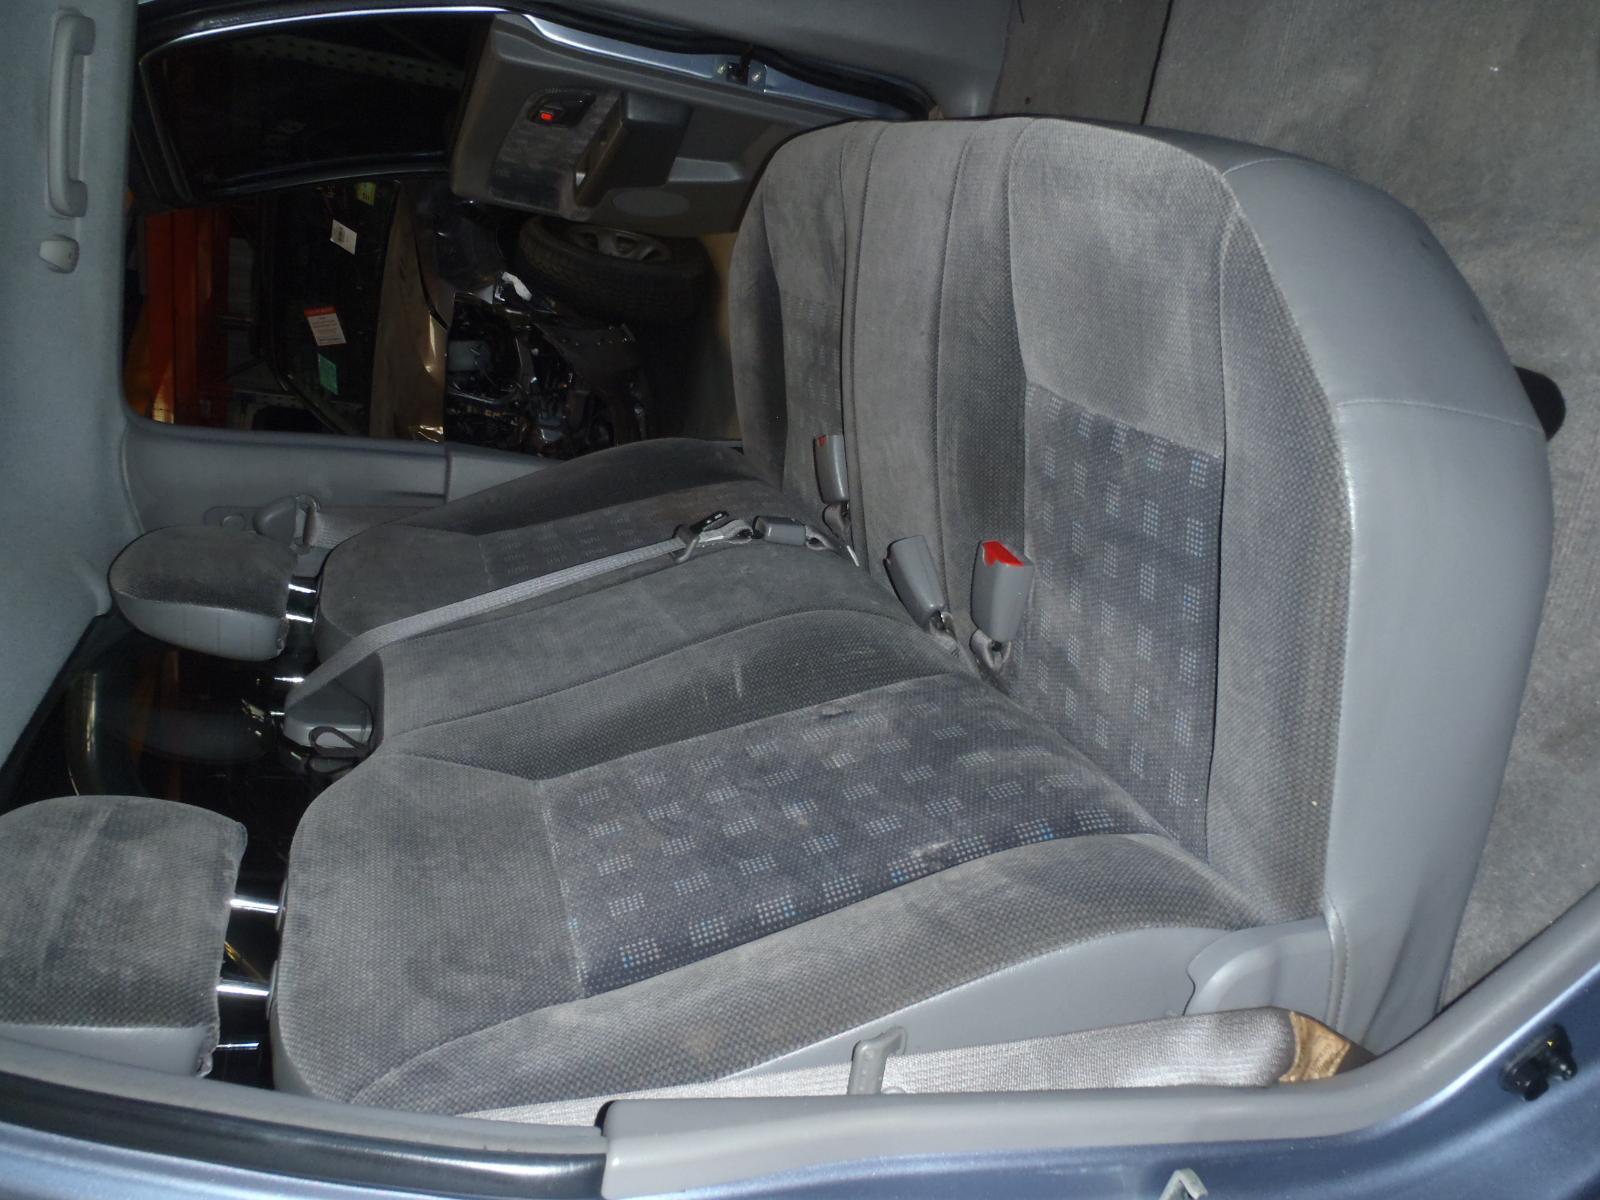 View Auto part P/S Reservoir Holden Rodeo 2004